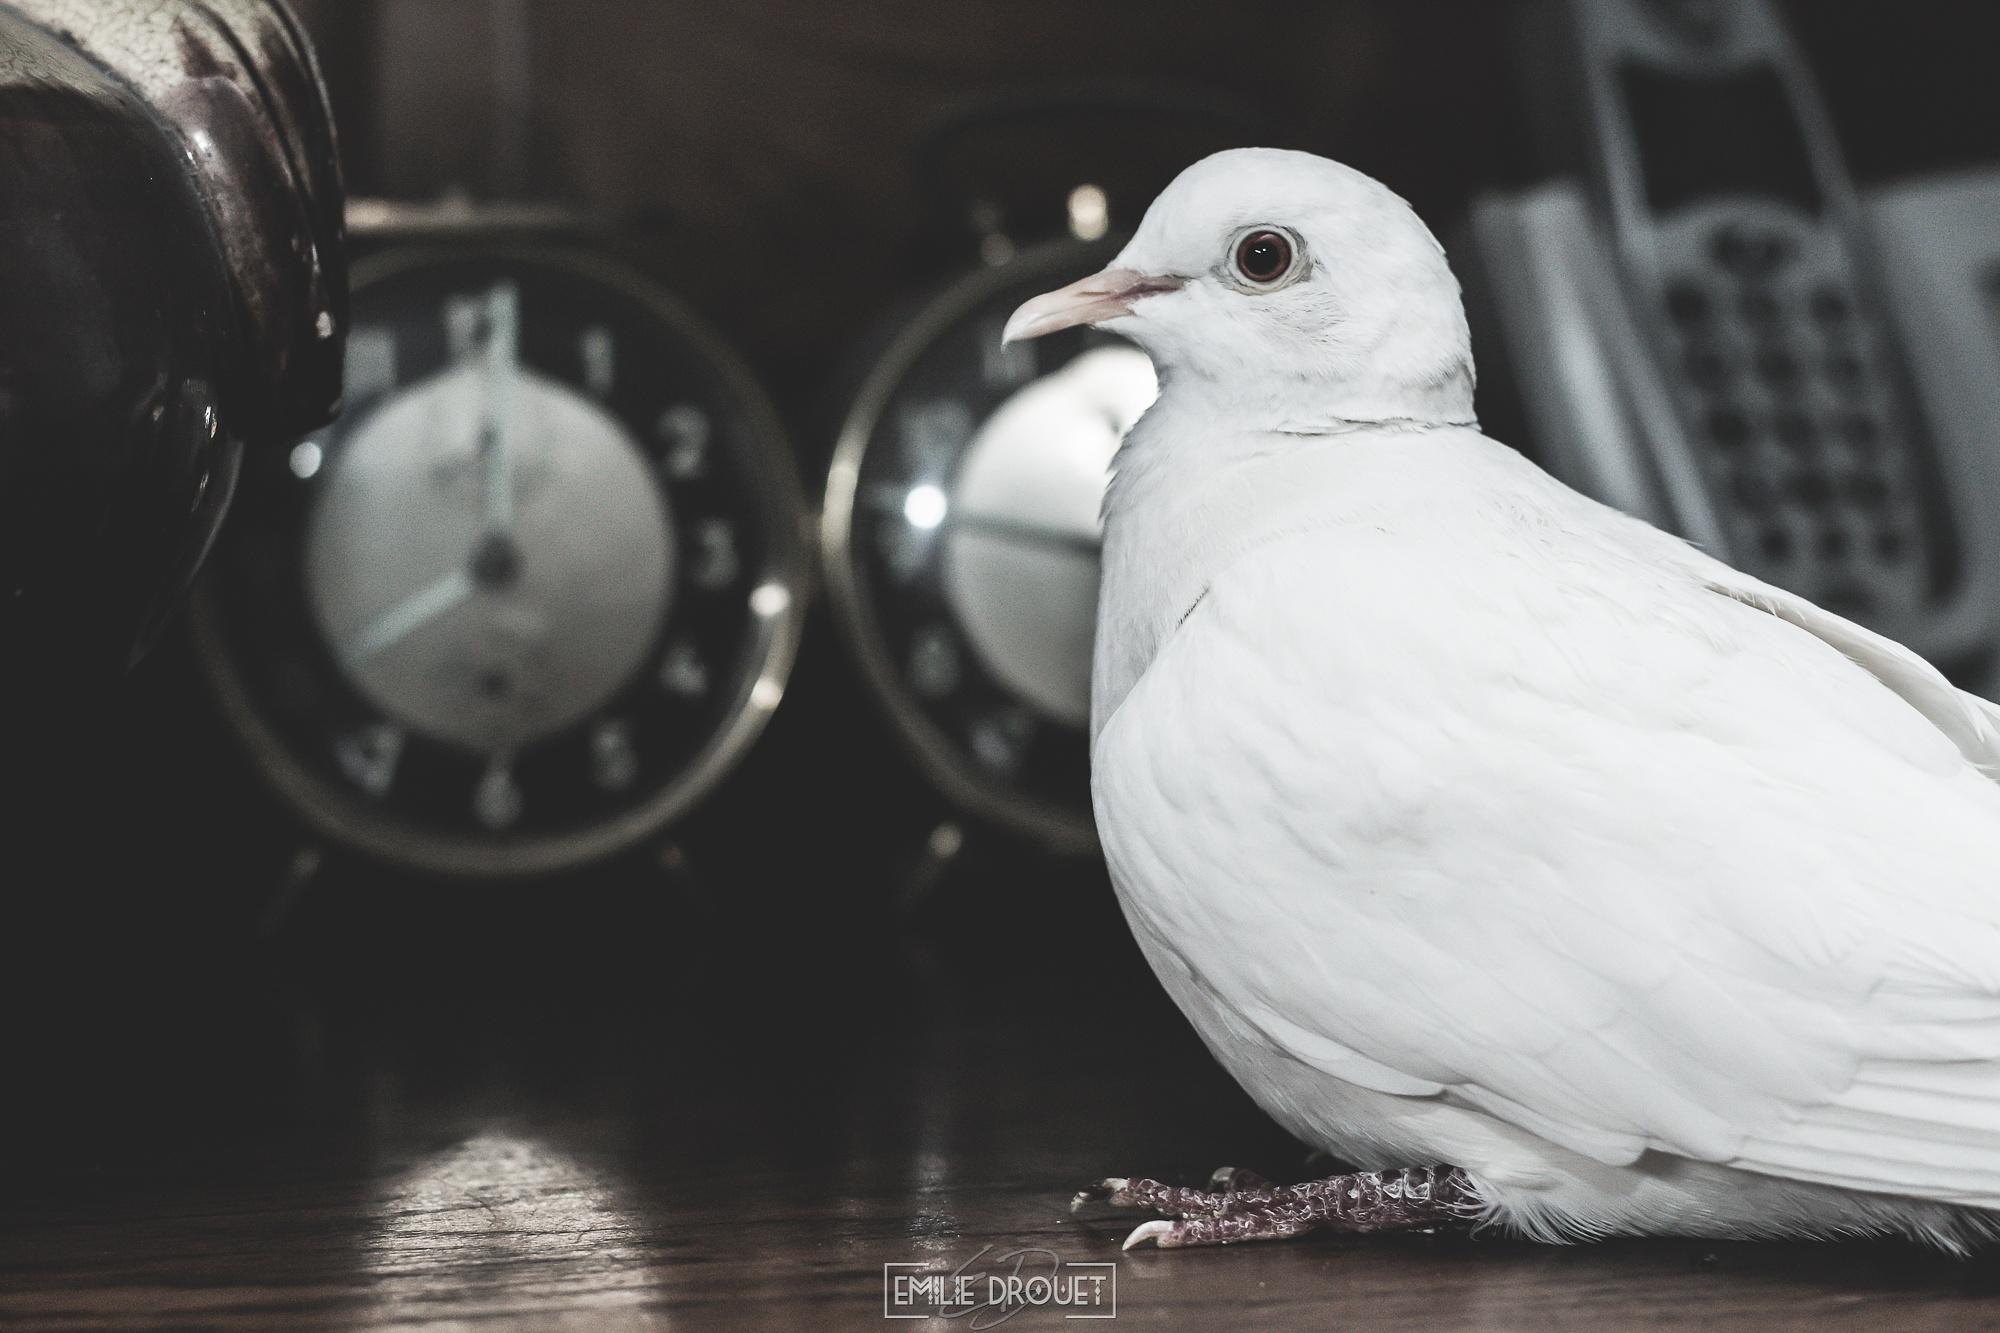 White dove 2 by Emilie Drouet